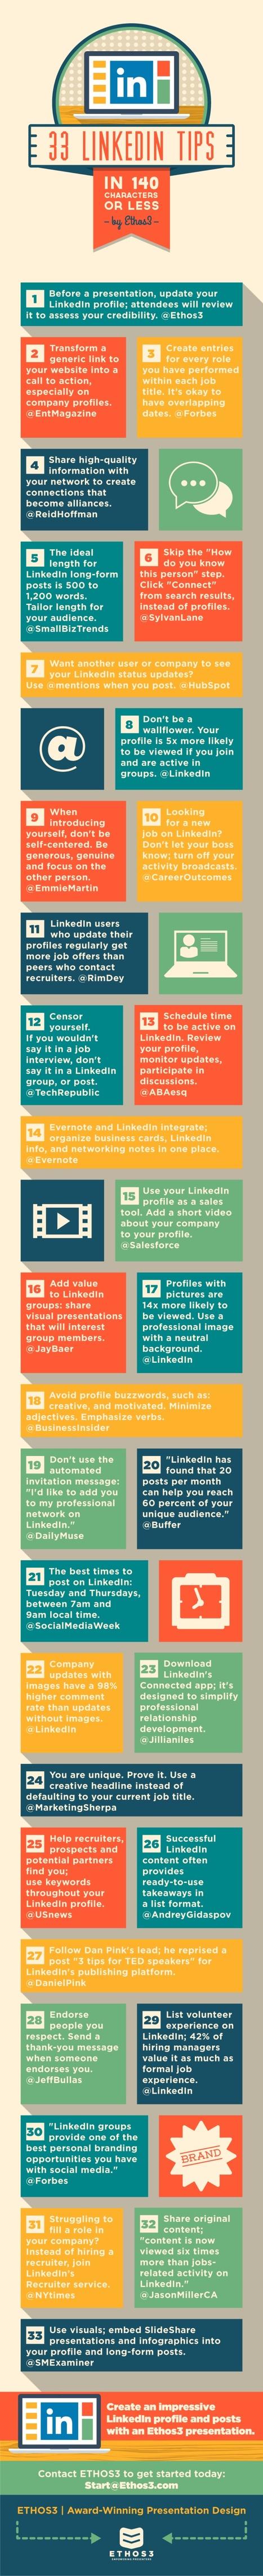 33 Tweetable Tips That'll Help You Master LinkedIn | Social Media Marketing | Scoop.it